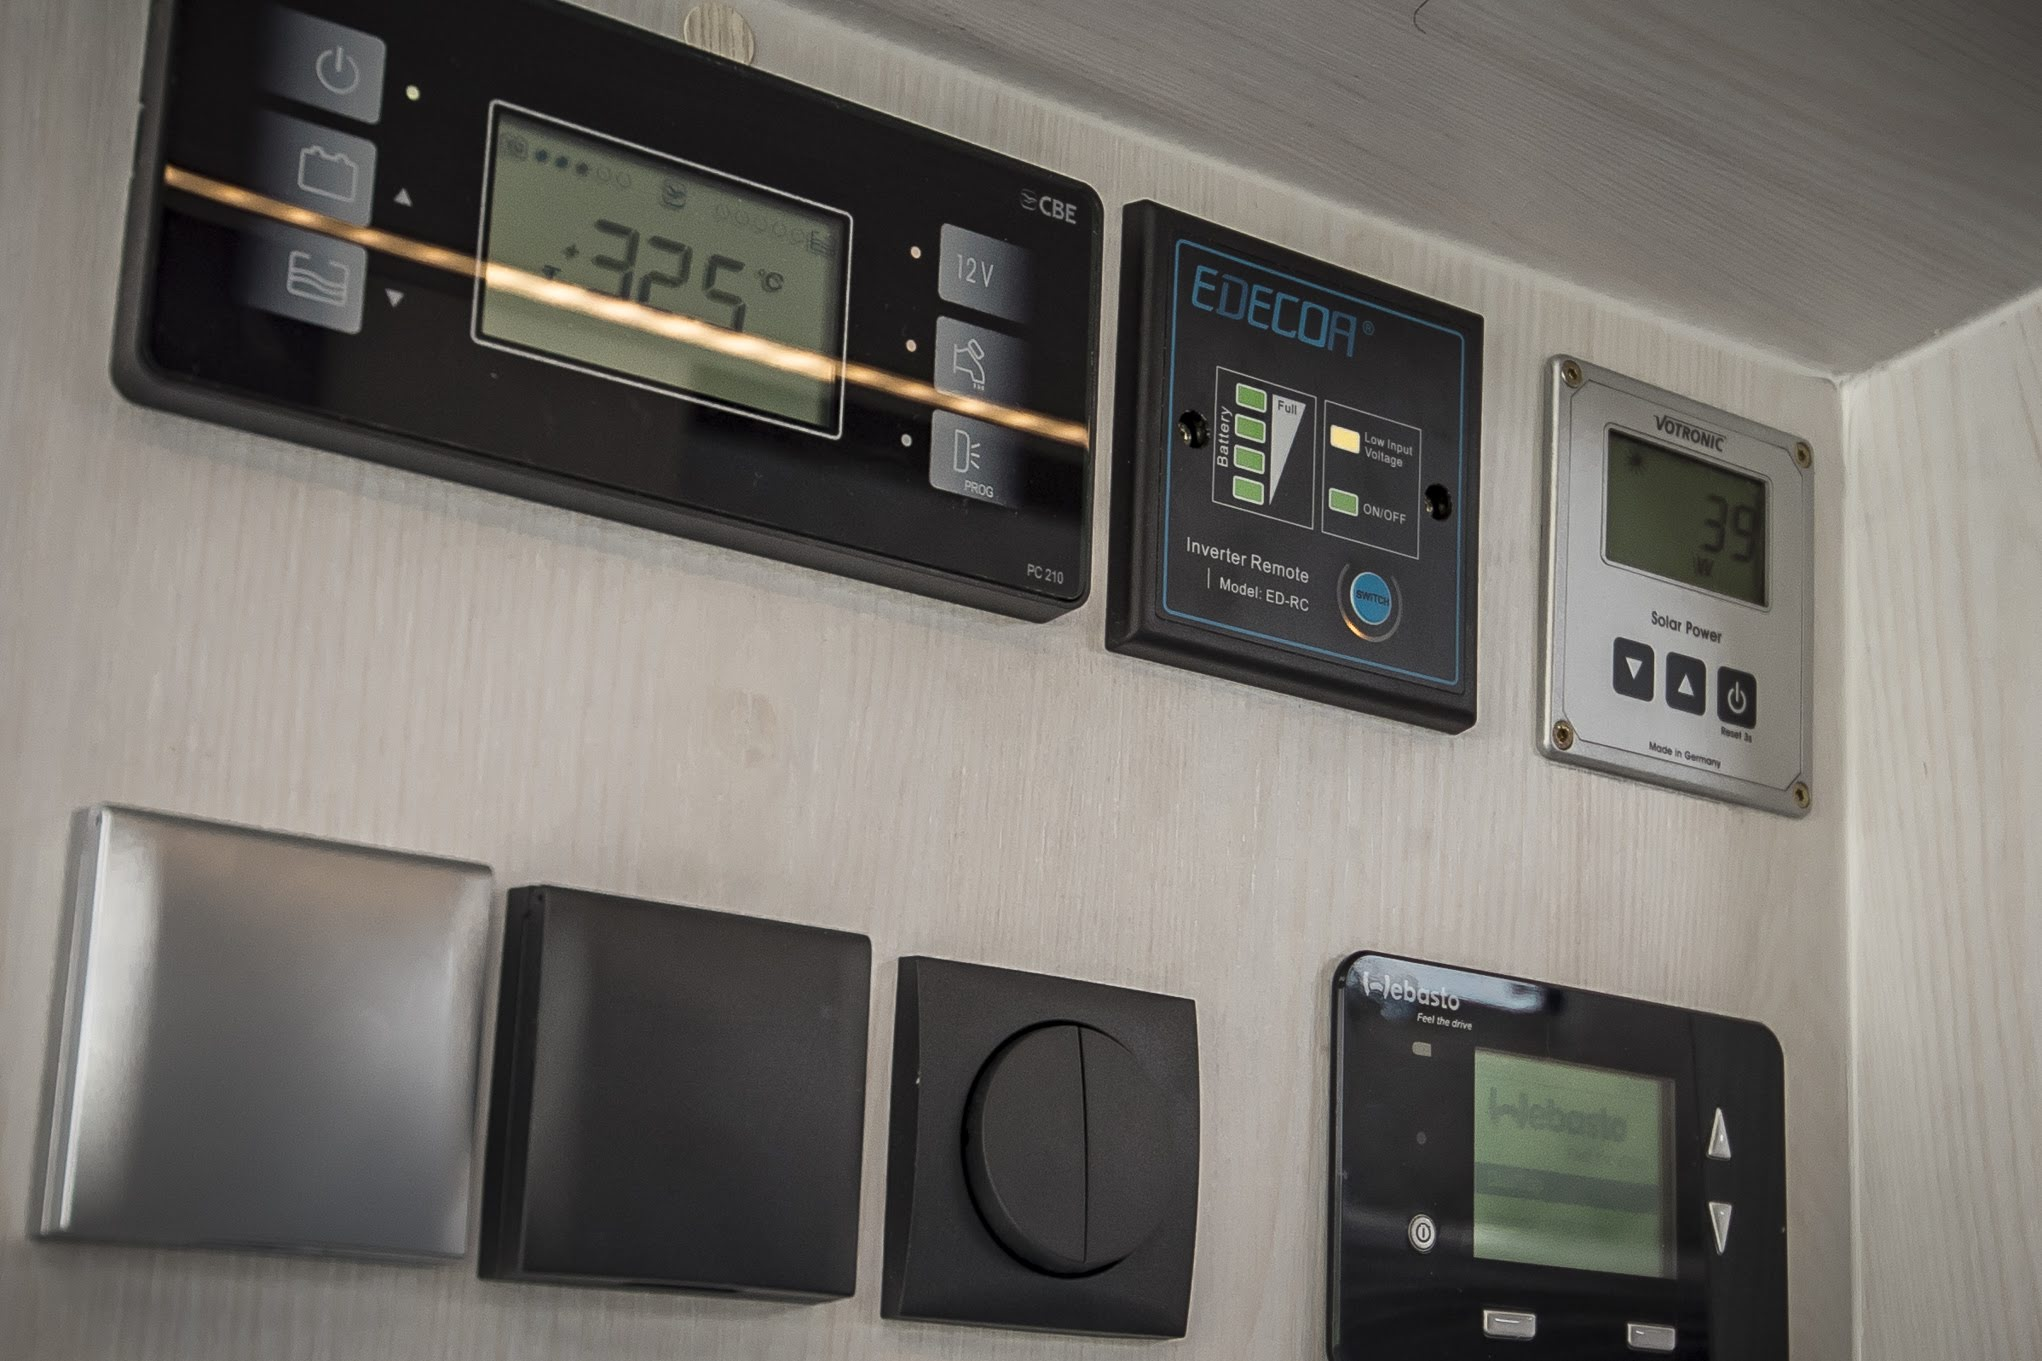 VR motorhome mainpanel hauptschalter camping webasto dual top evo 8 CBE Votronic solar wechselrichter 220v schalter